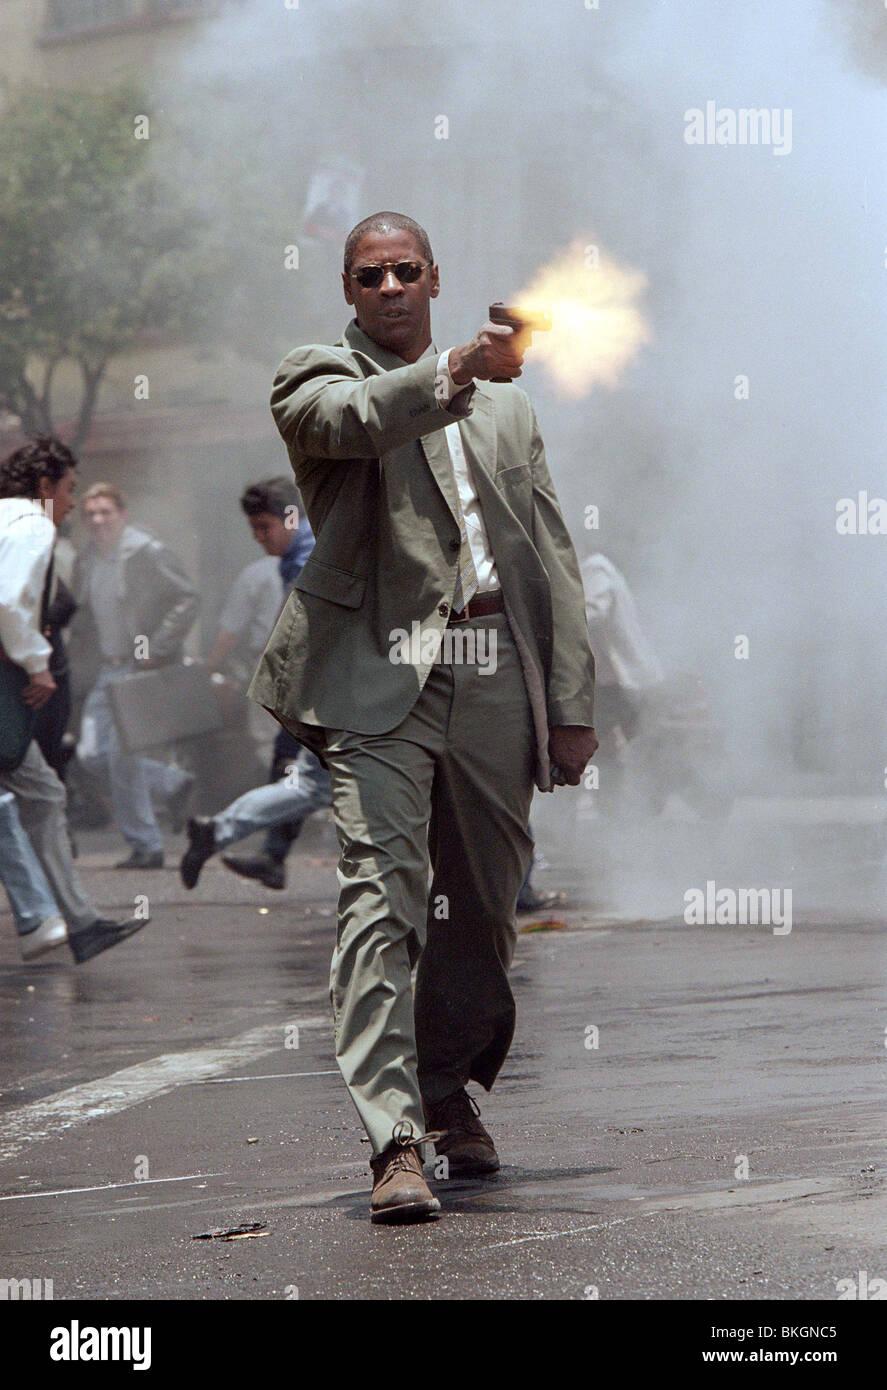 MAN ON FIRE (2004) DENZEL WASHINGTON MNOF 001-20 - Stock Image